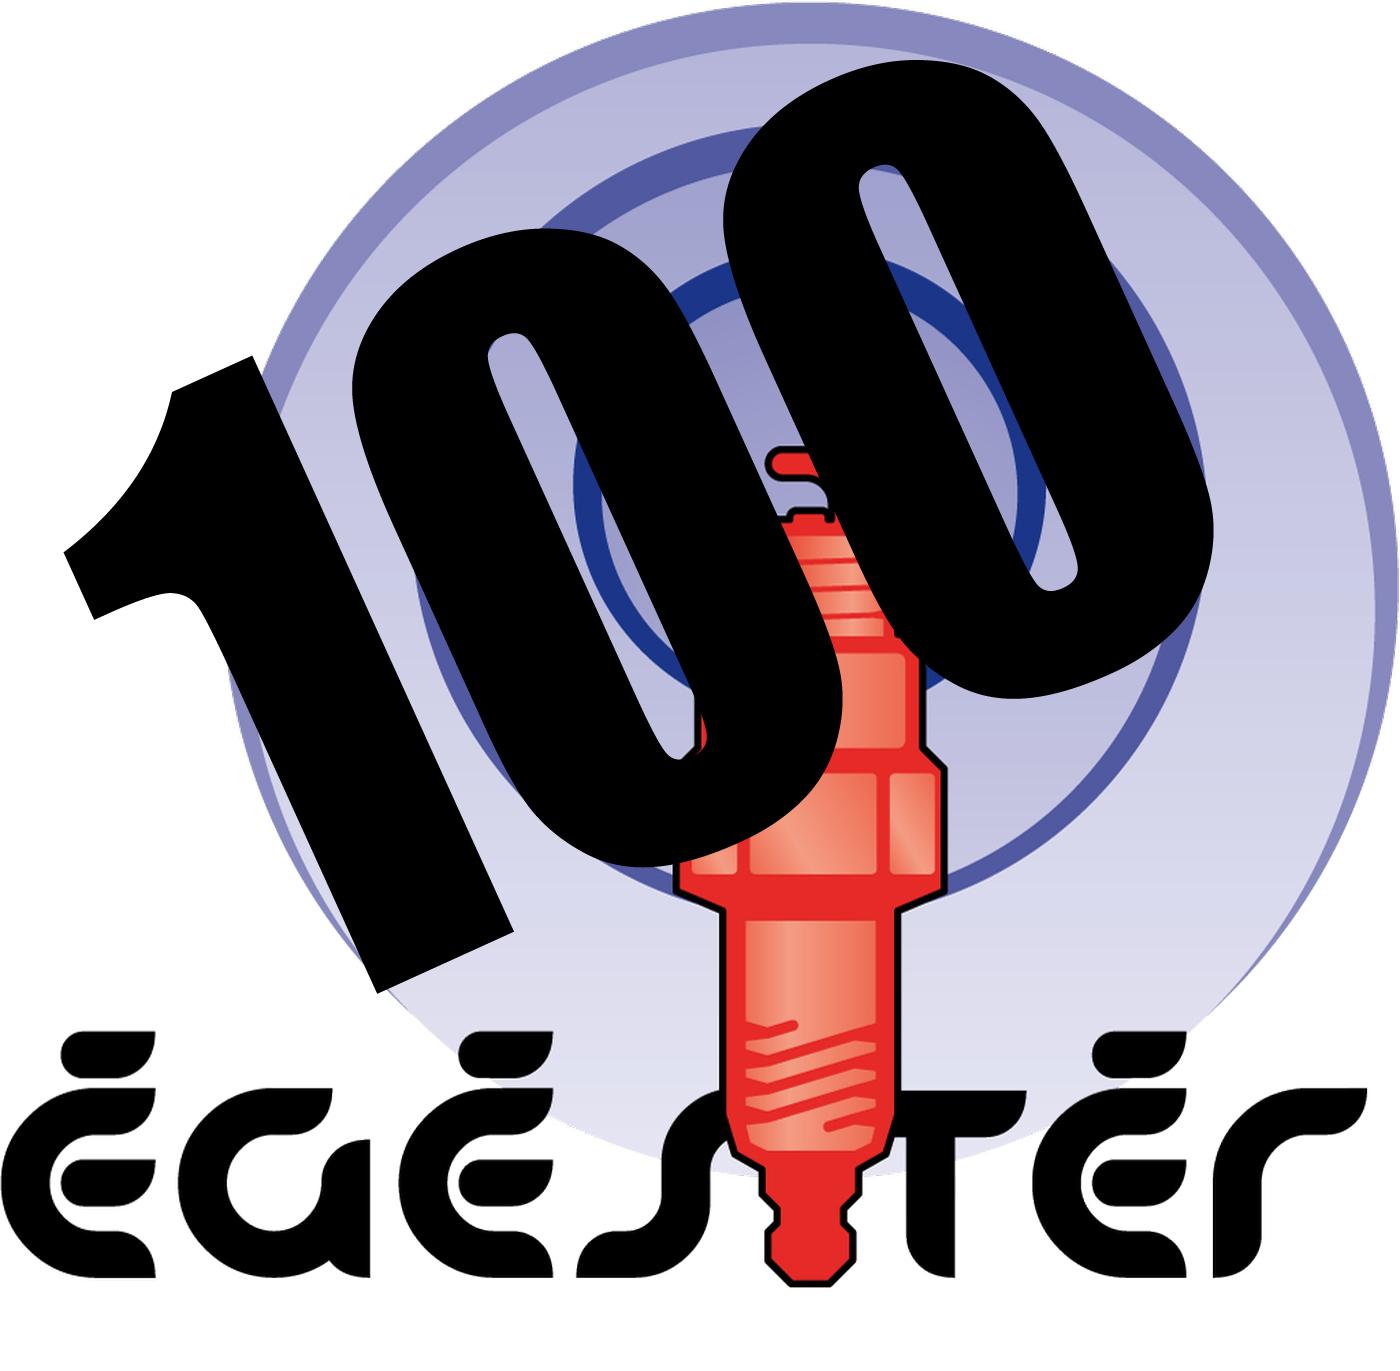 logo02 100.jpg